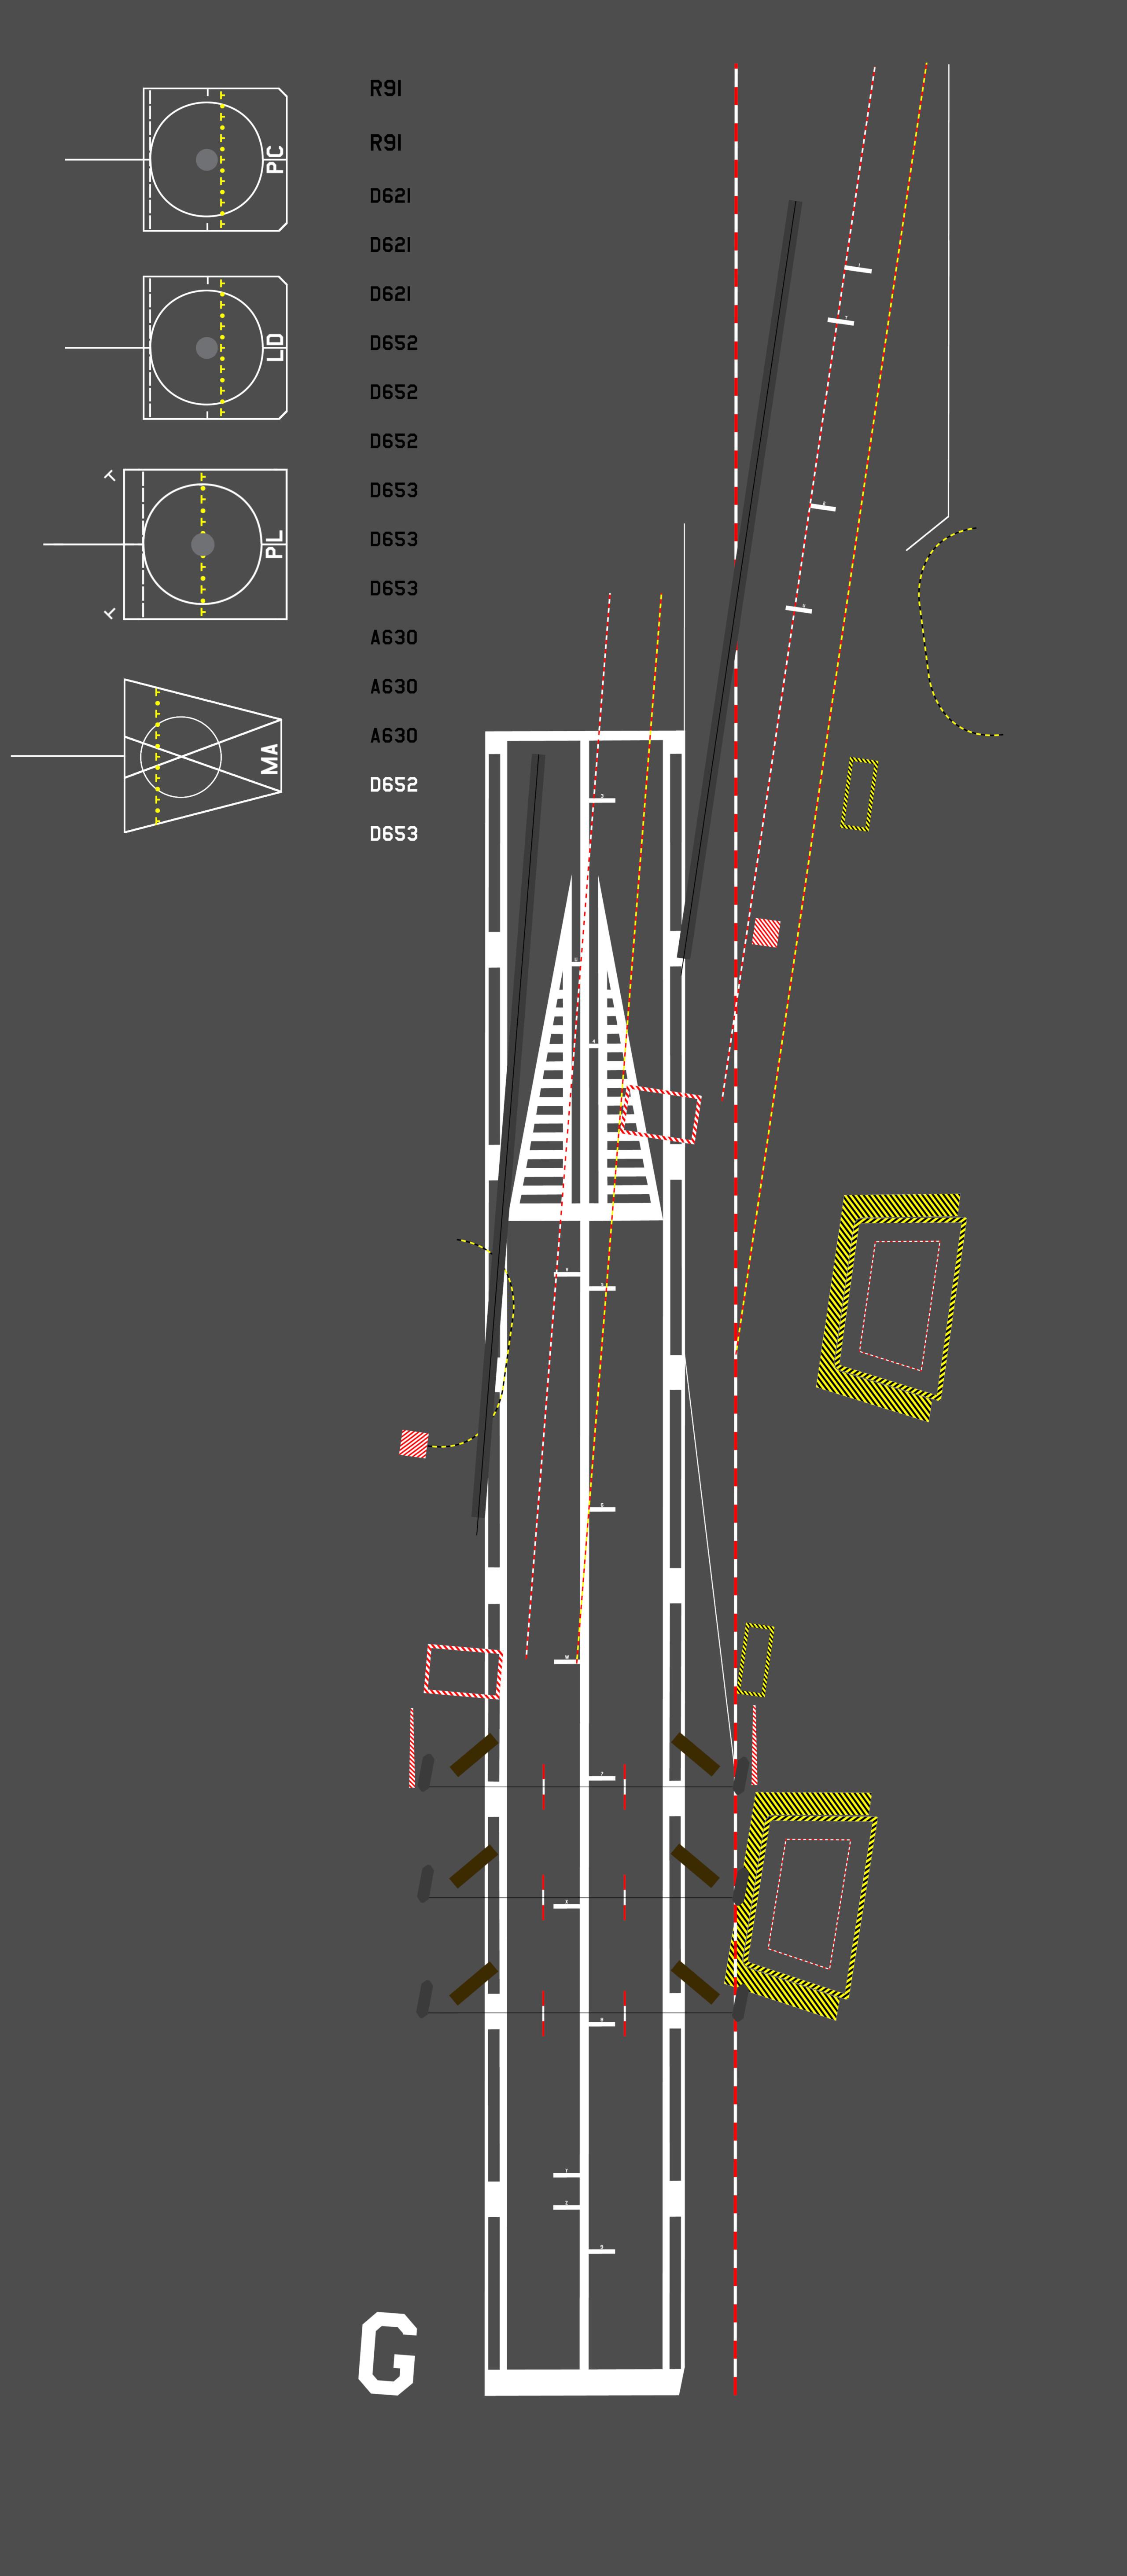 Diorama Groupe Aéronaval Français 2021 - 1/1800 - Impression 3D - Page 3 Final10